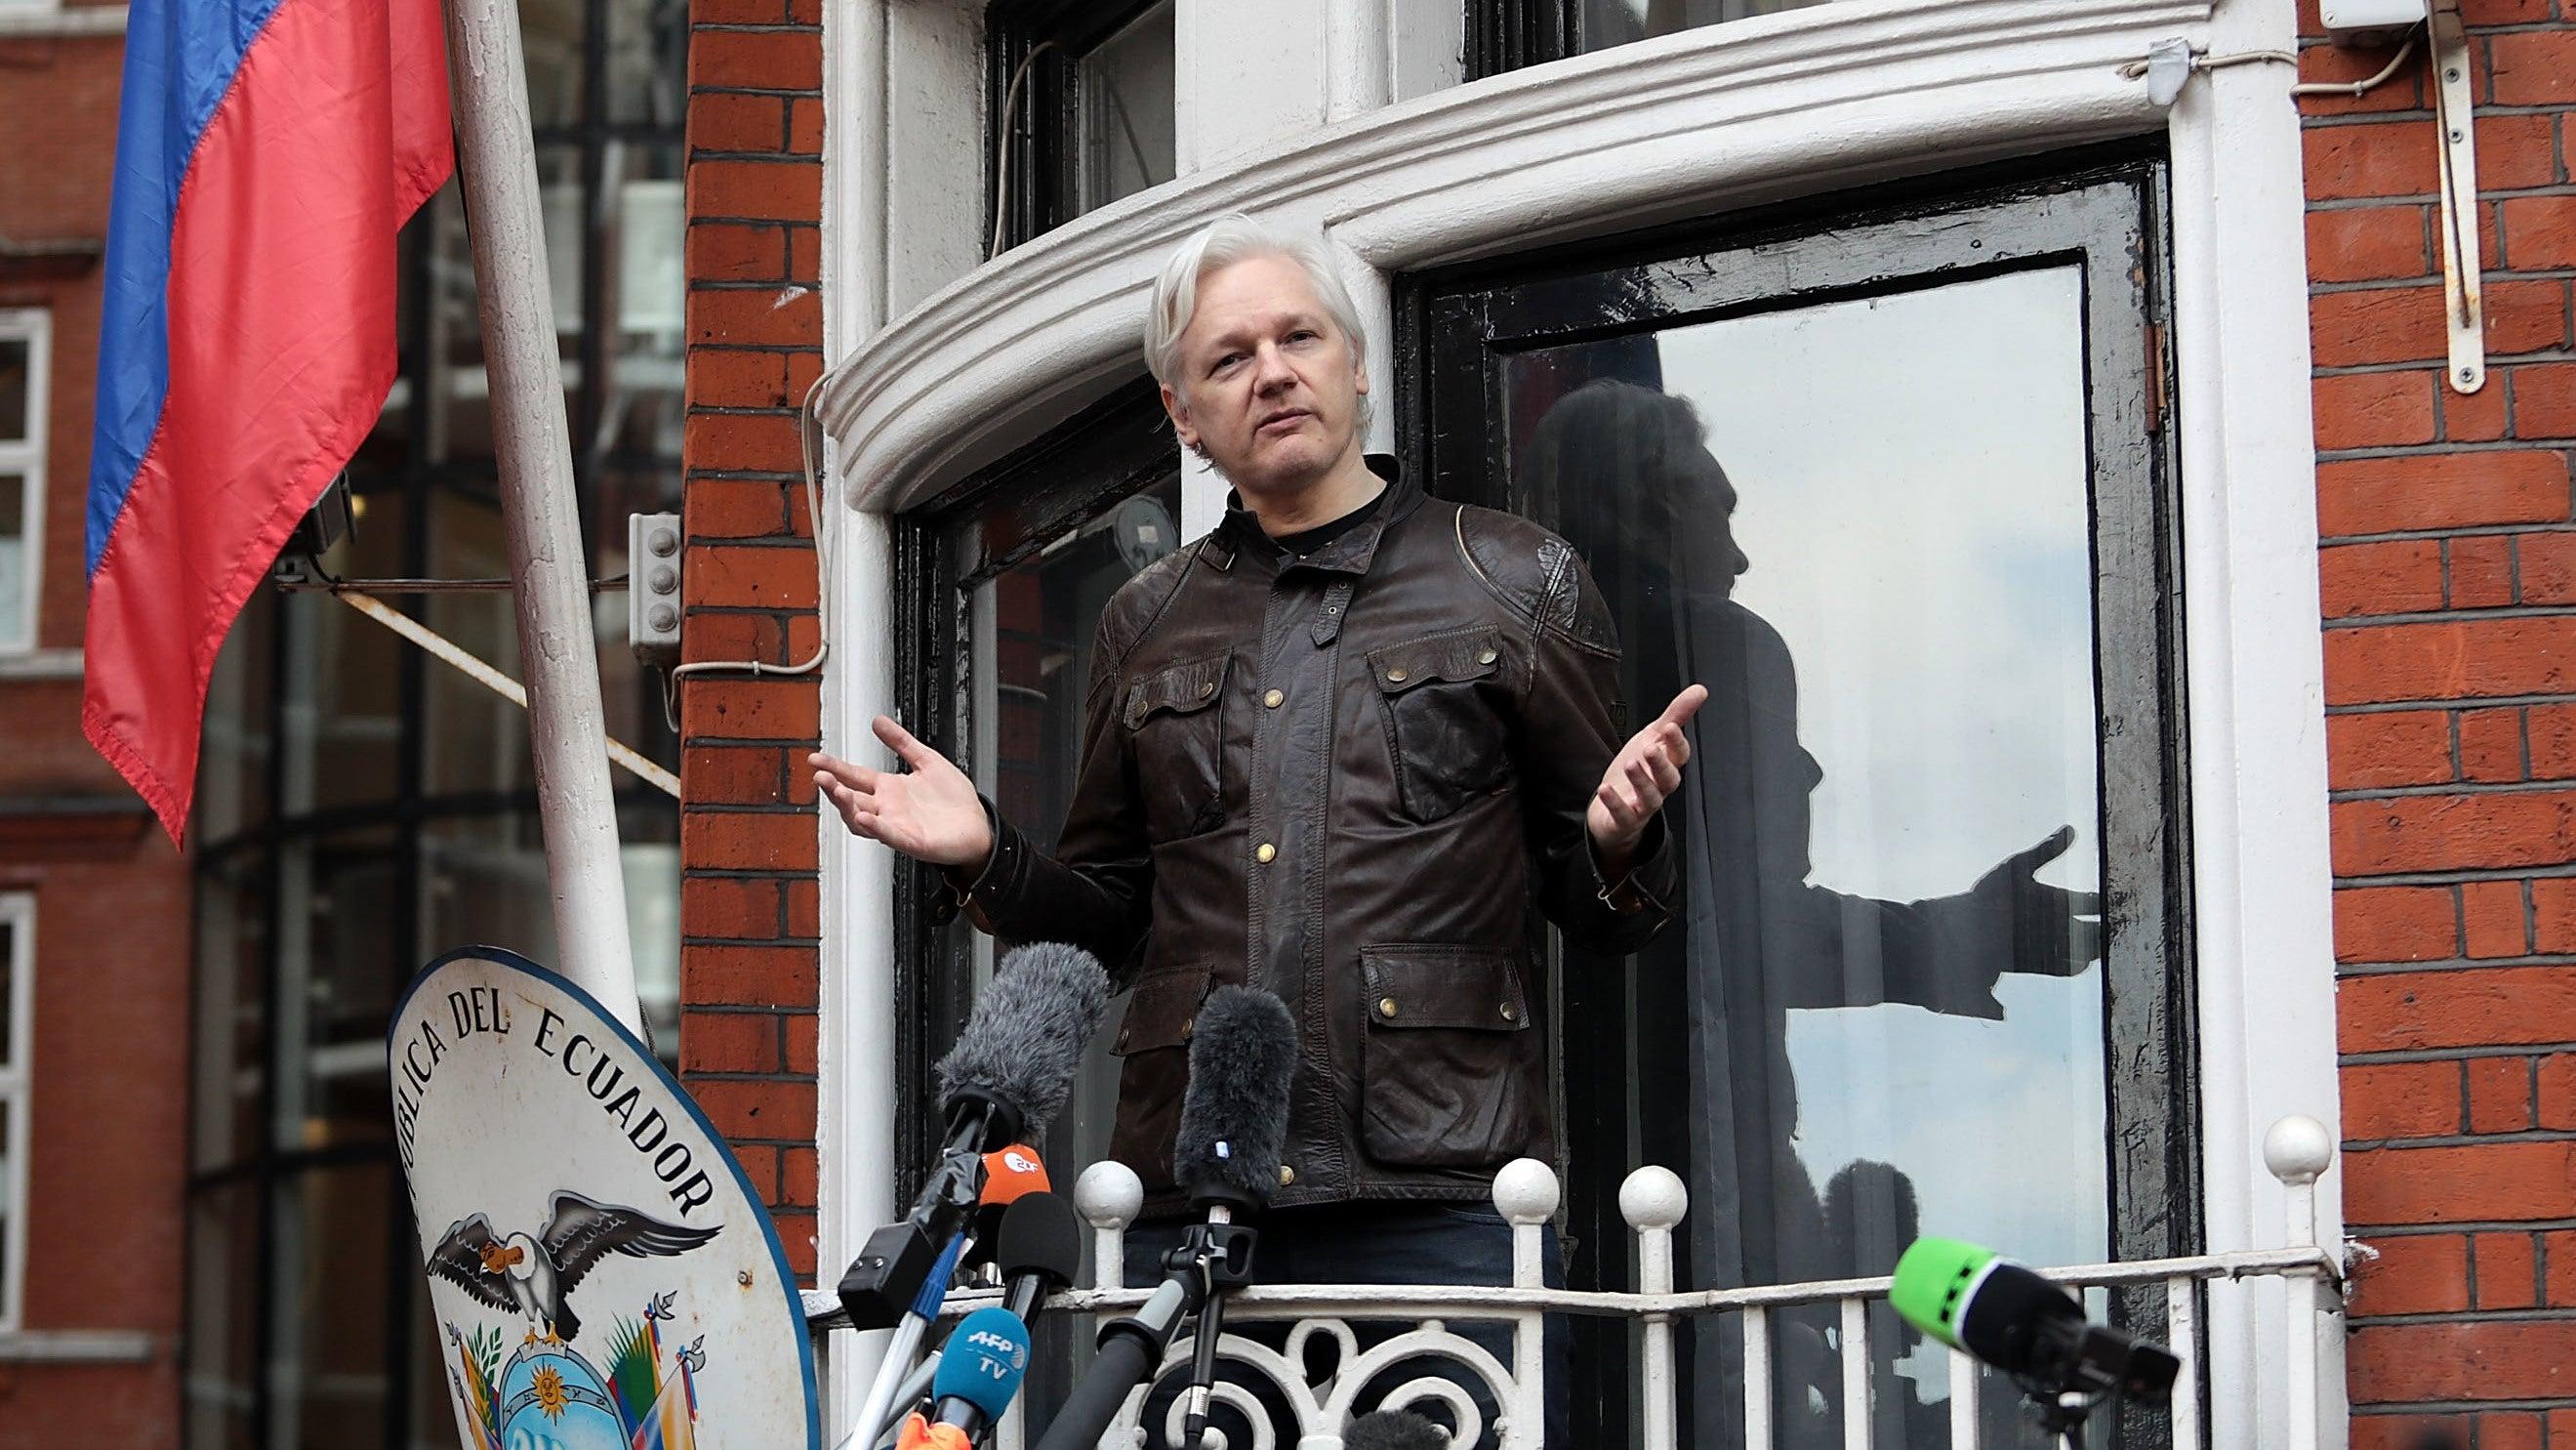 Julian Assange Asks UK Court To Drop Arrest Warrant By Invoking The Fonzie Defence